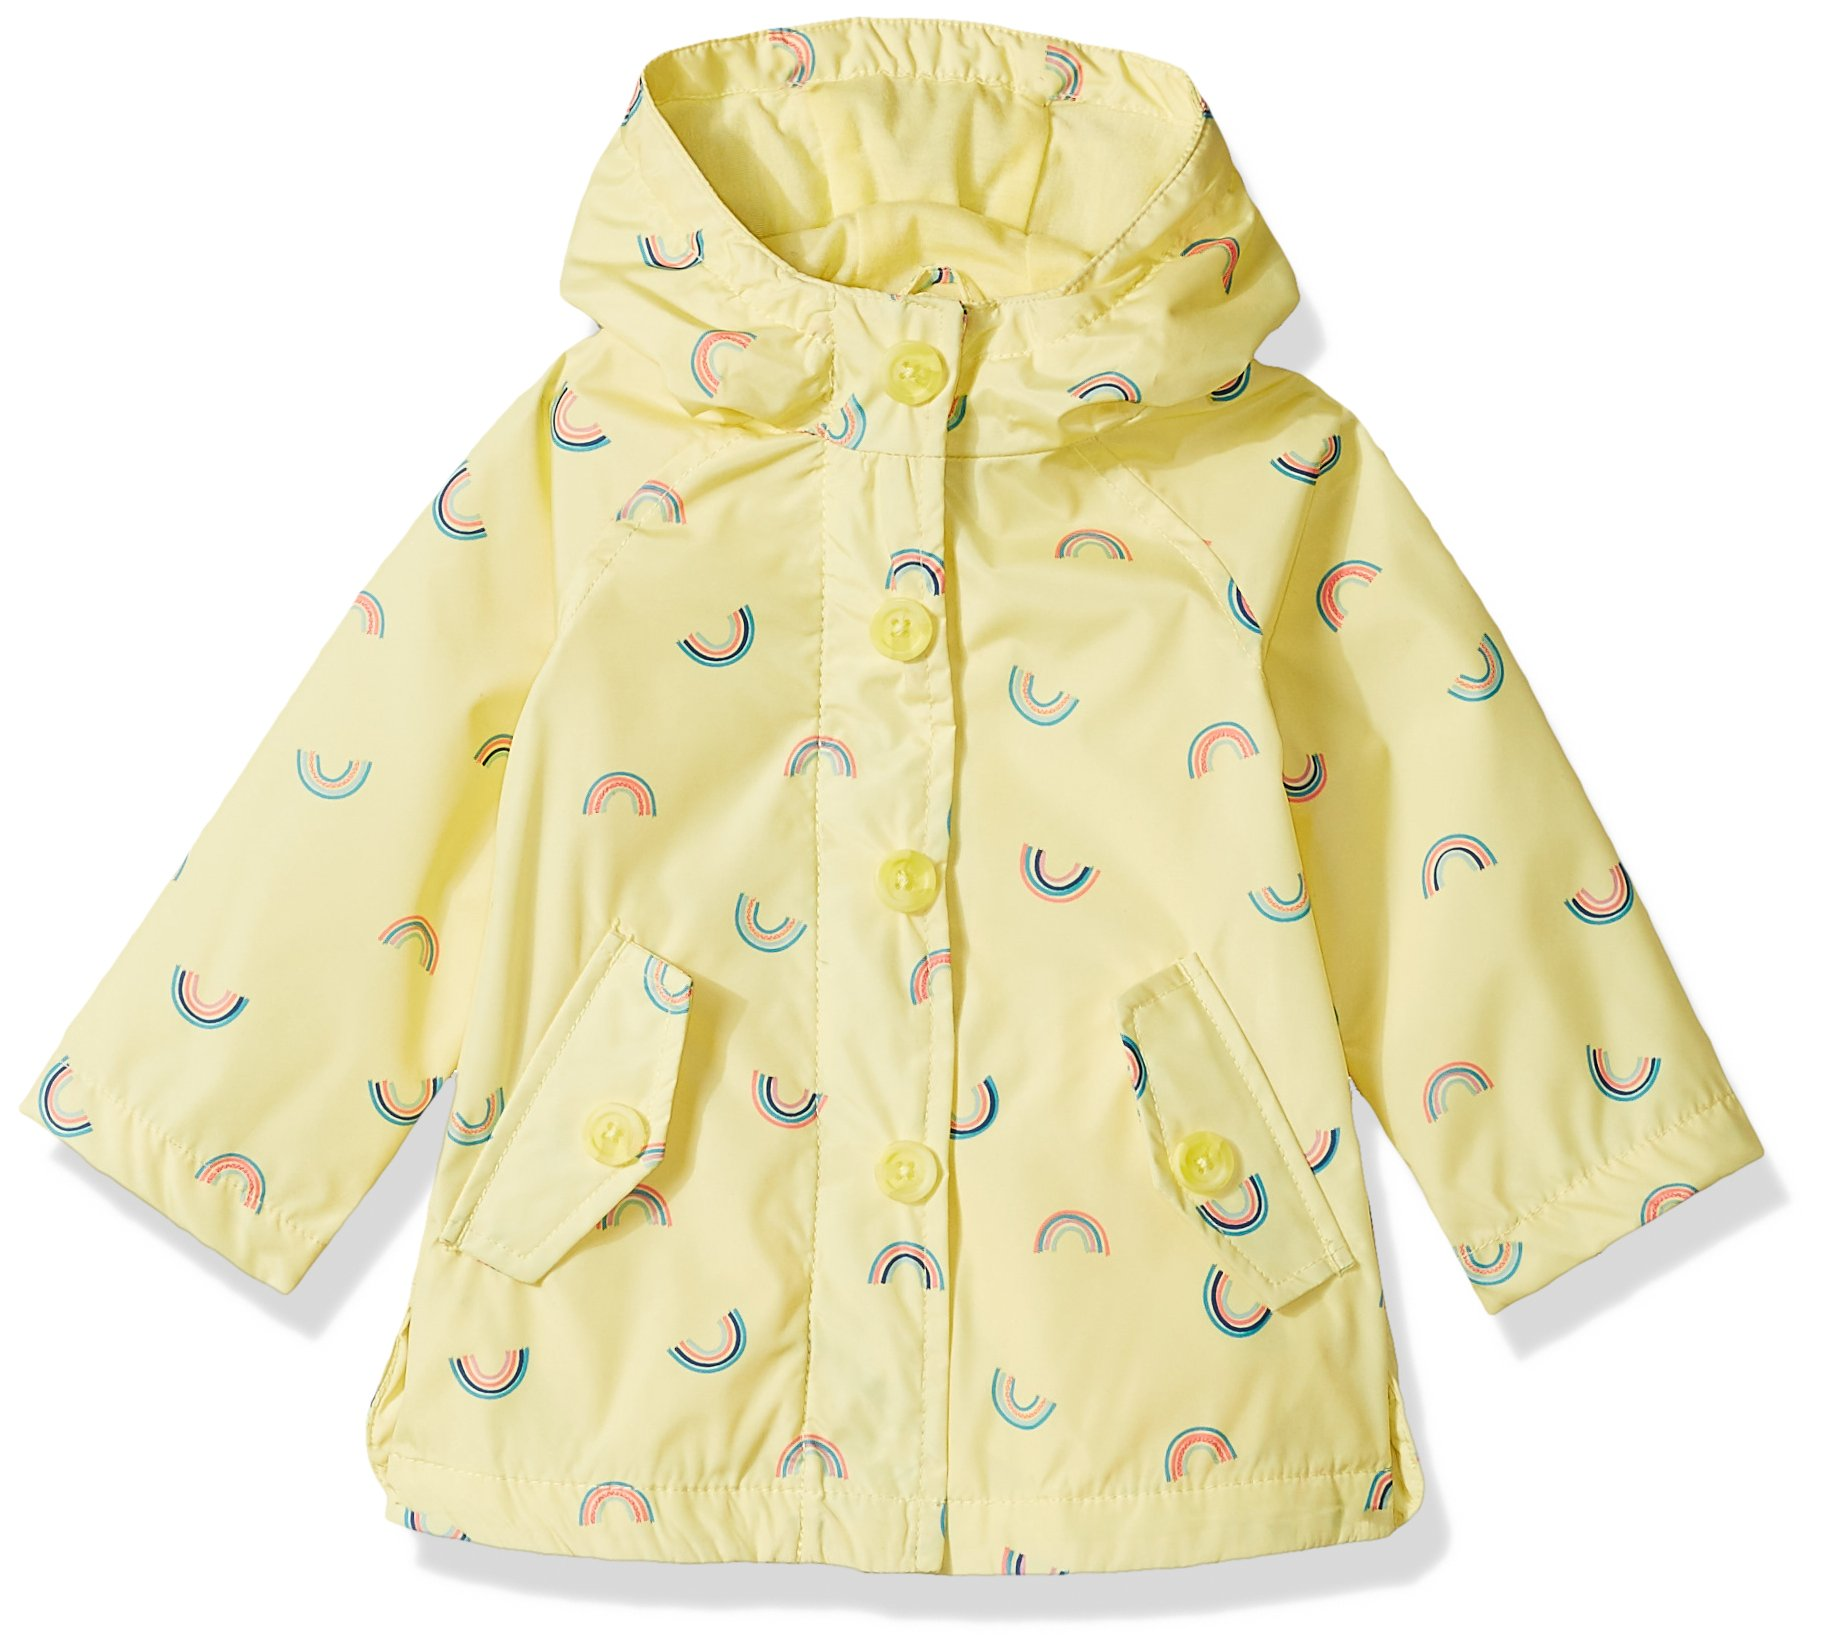 OshKosh B'Gosh Osh Kosh Baby Girls Sweet LIL' Rainslicker Rain Jacket, Rainbows Lemonade, 18M